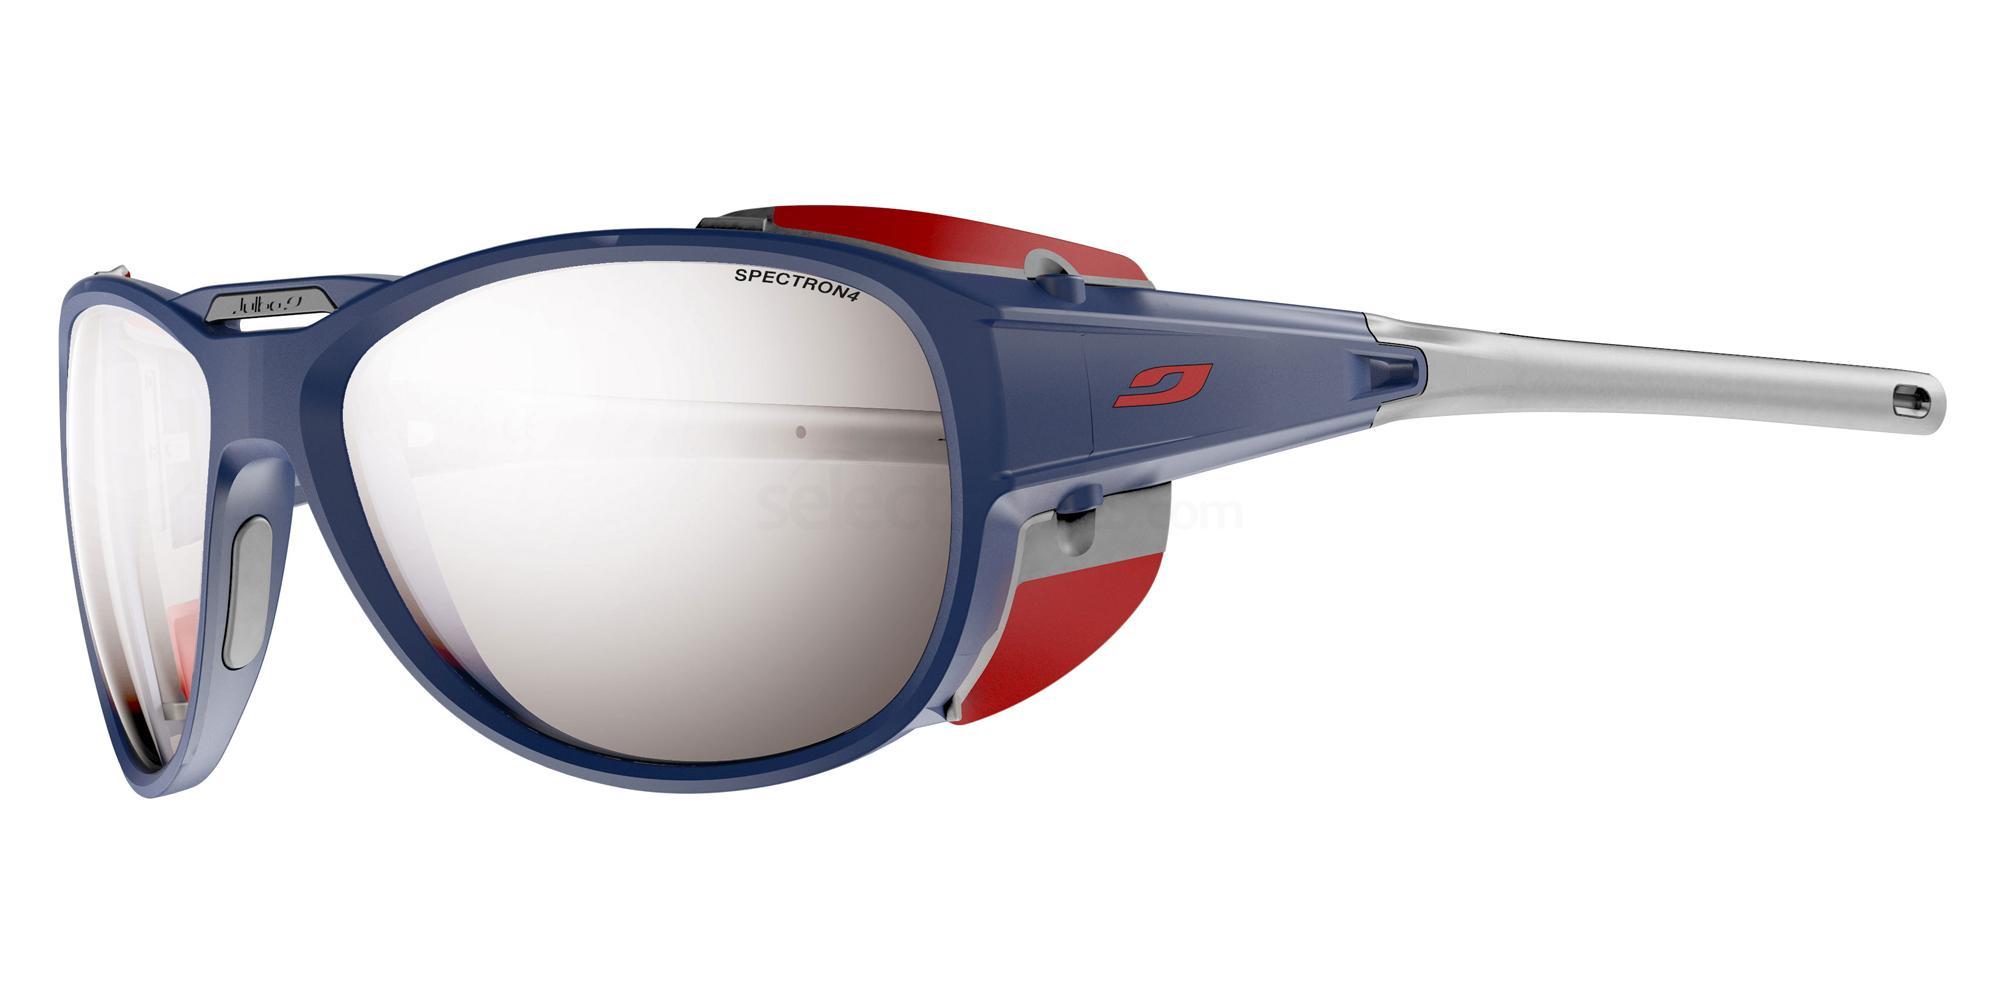 1212 497 EXPLORER 2.0 Sunglasses, Julbo